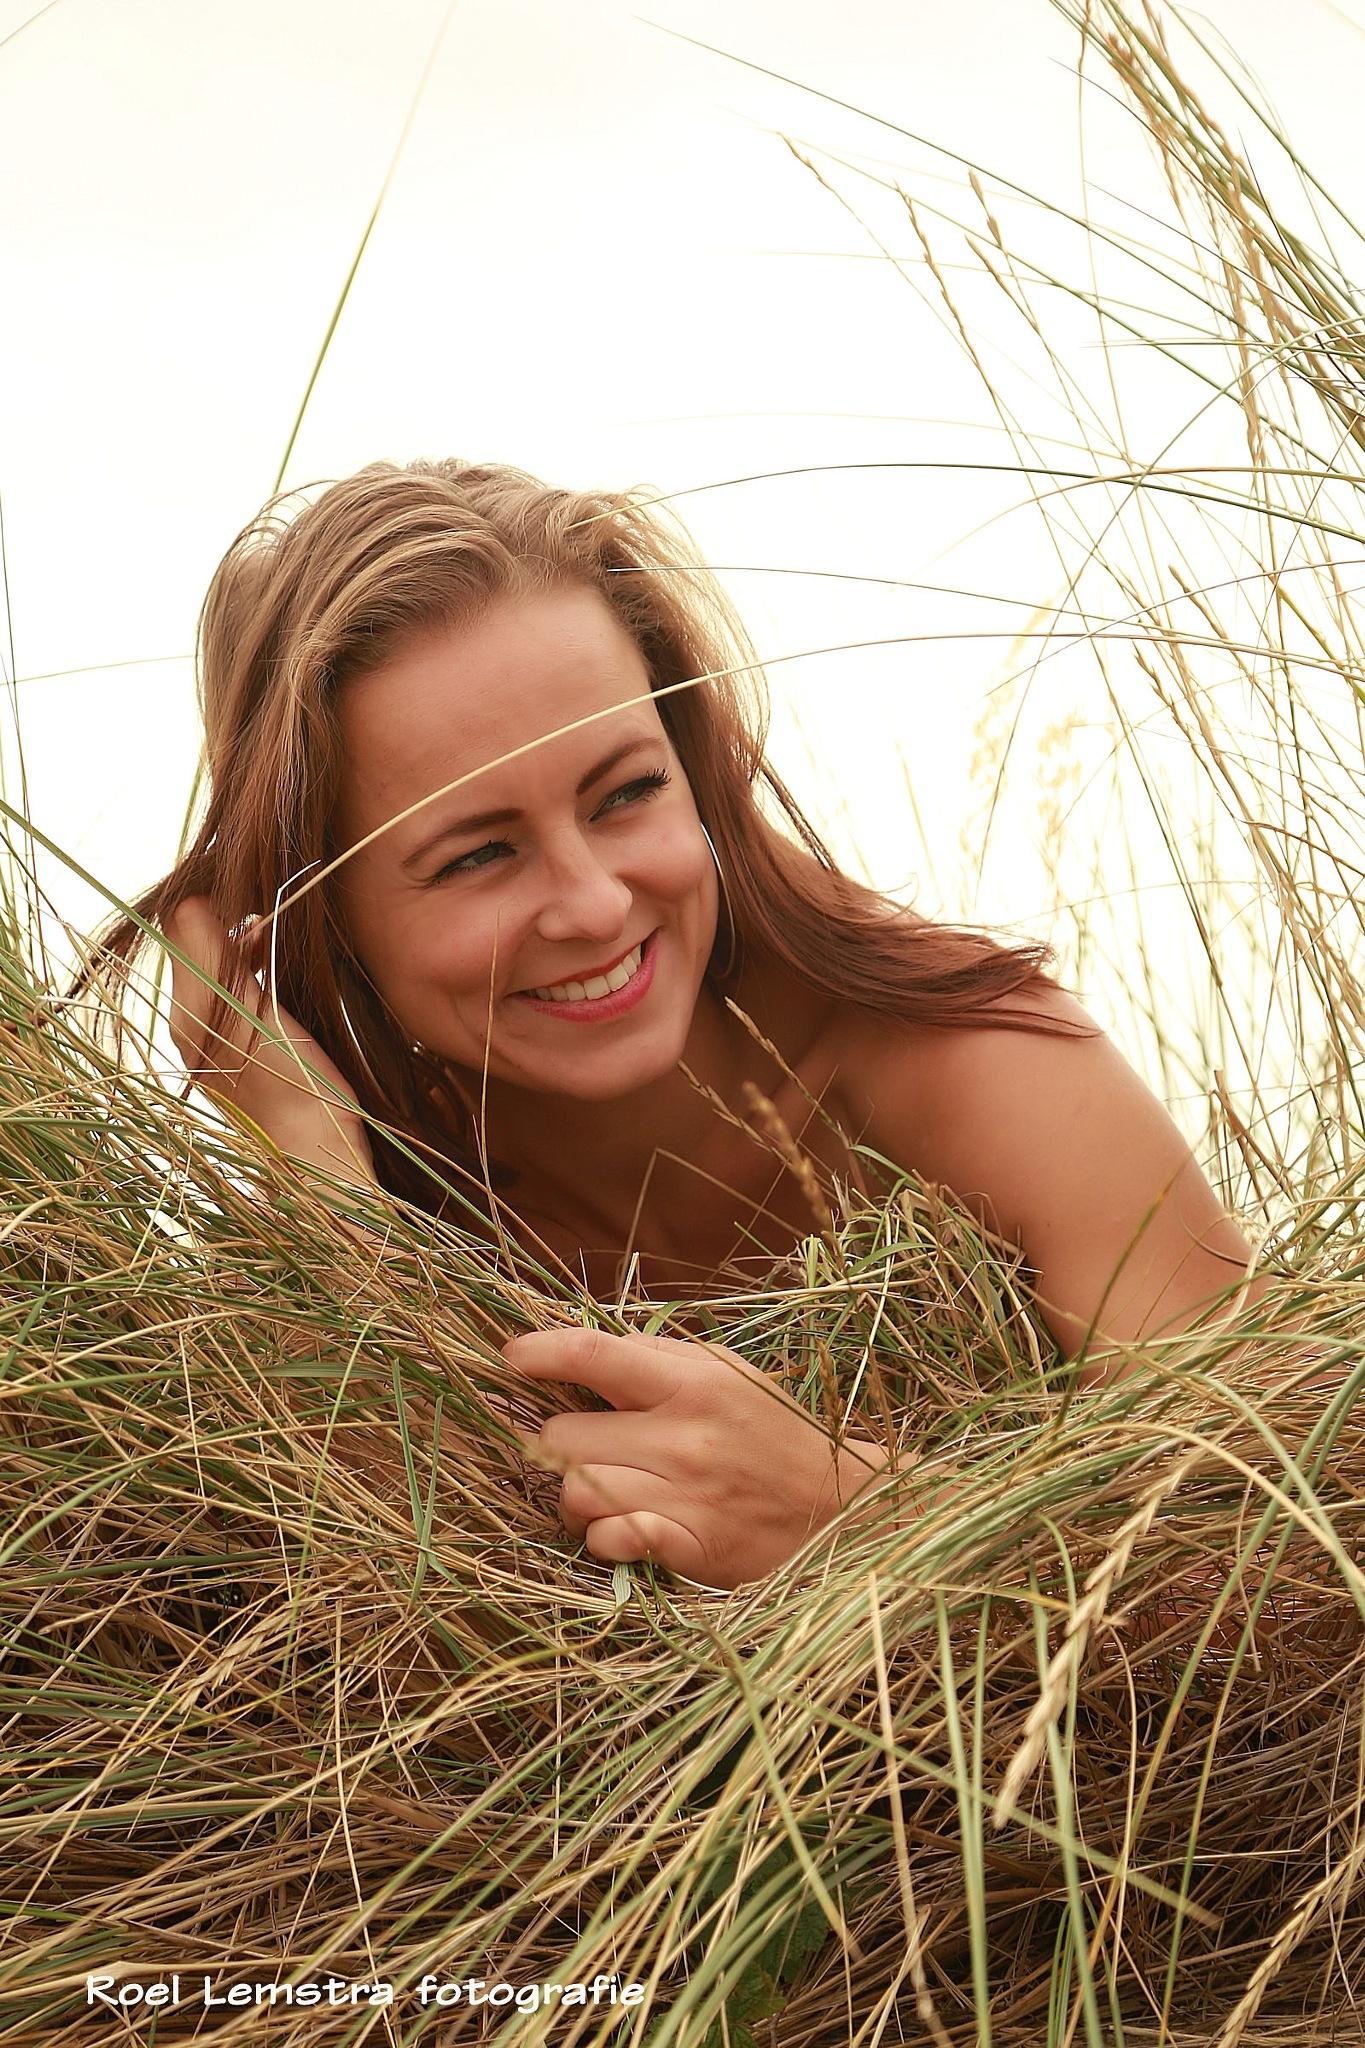 always that happy smile by roel.lemstra